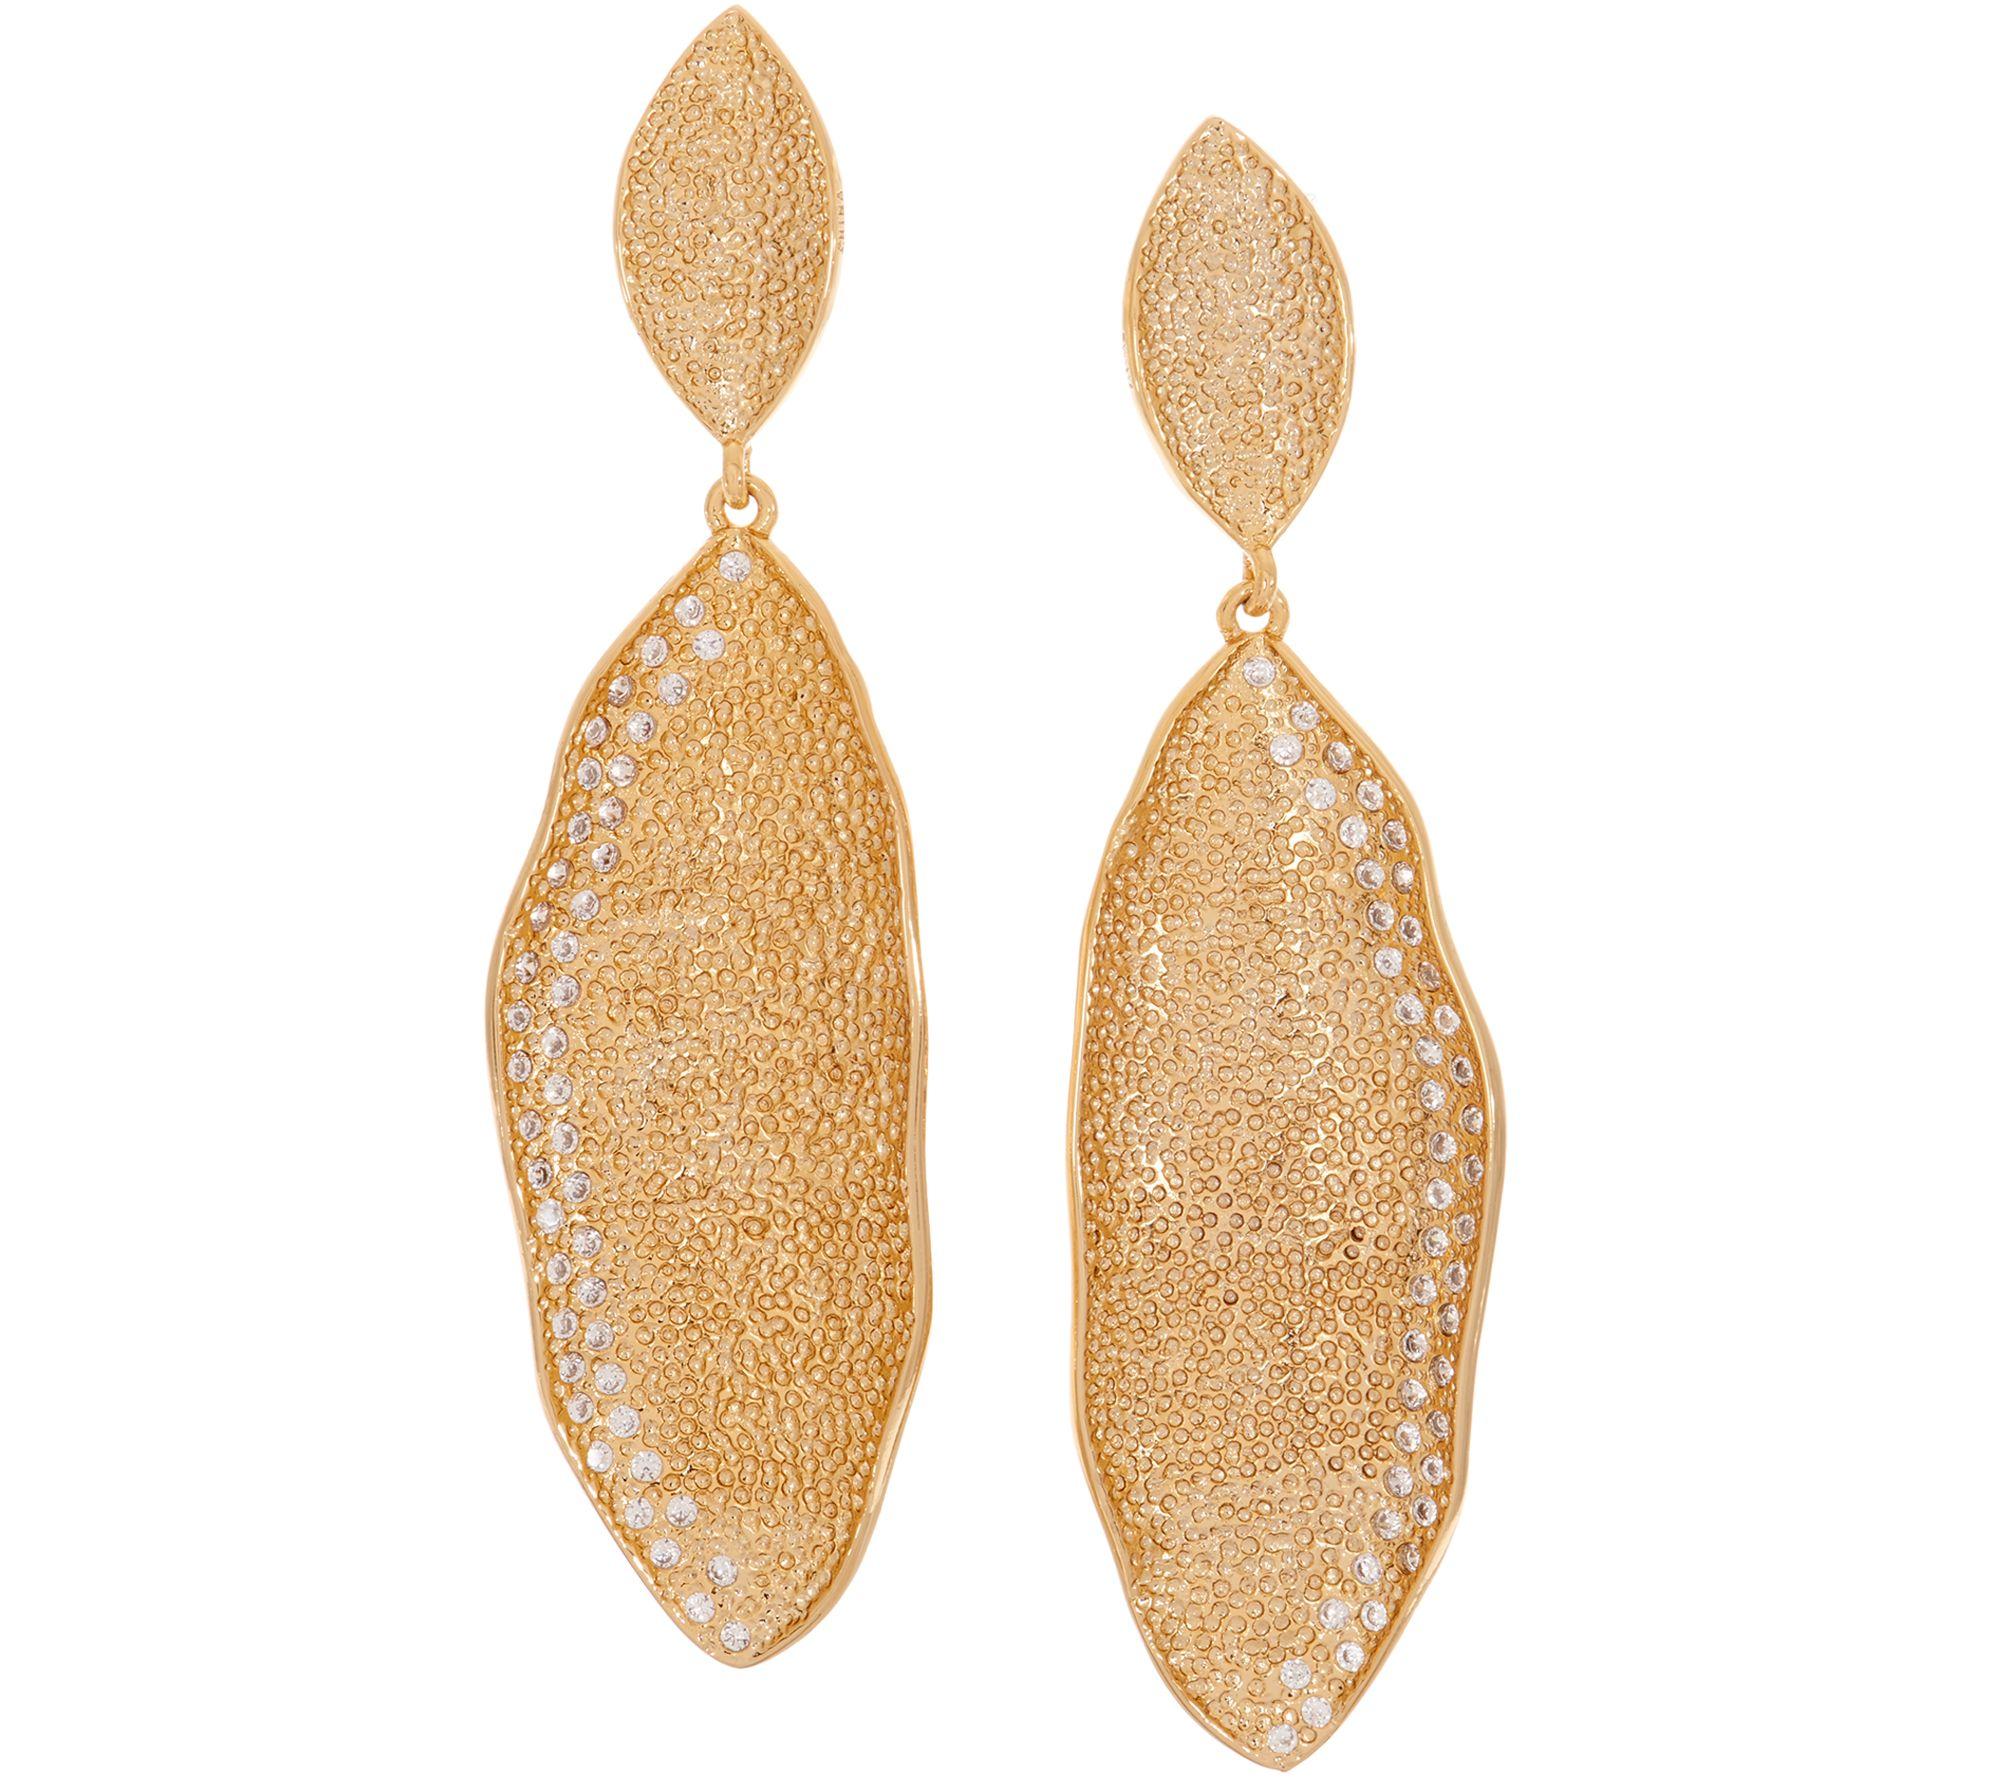 78bc0c00e55a6 Melinda Maria Simulated Pave Feather Earrings - Hepburn — QVC.com